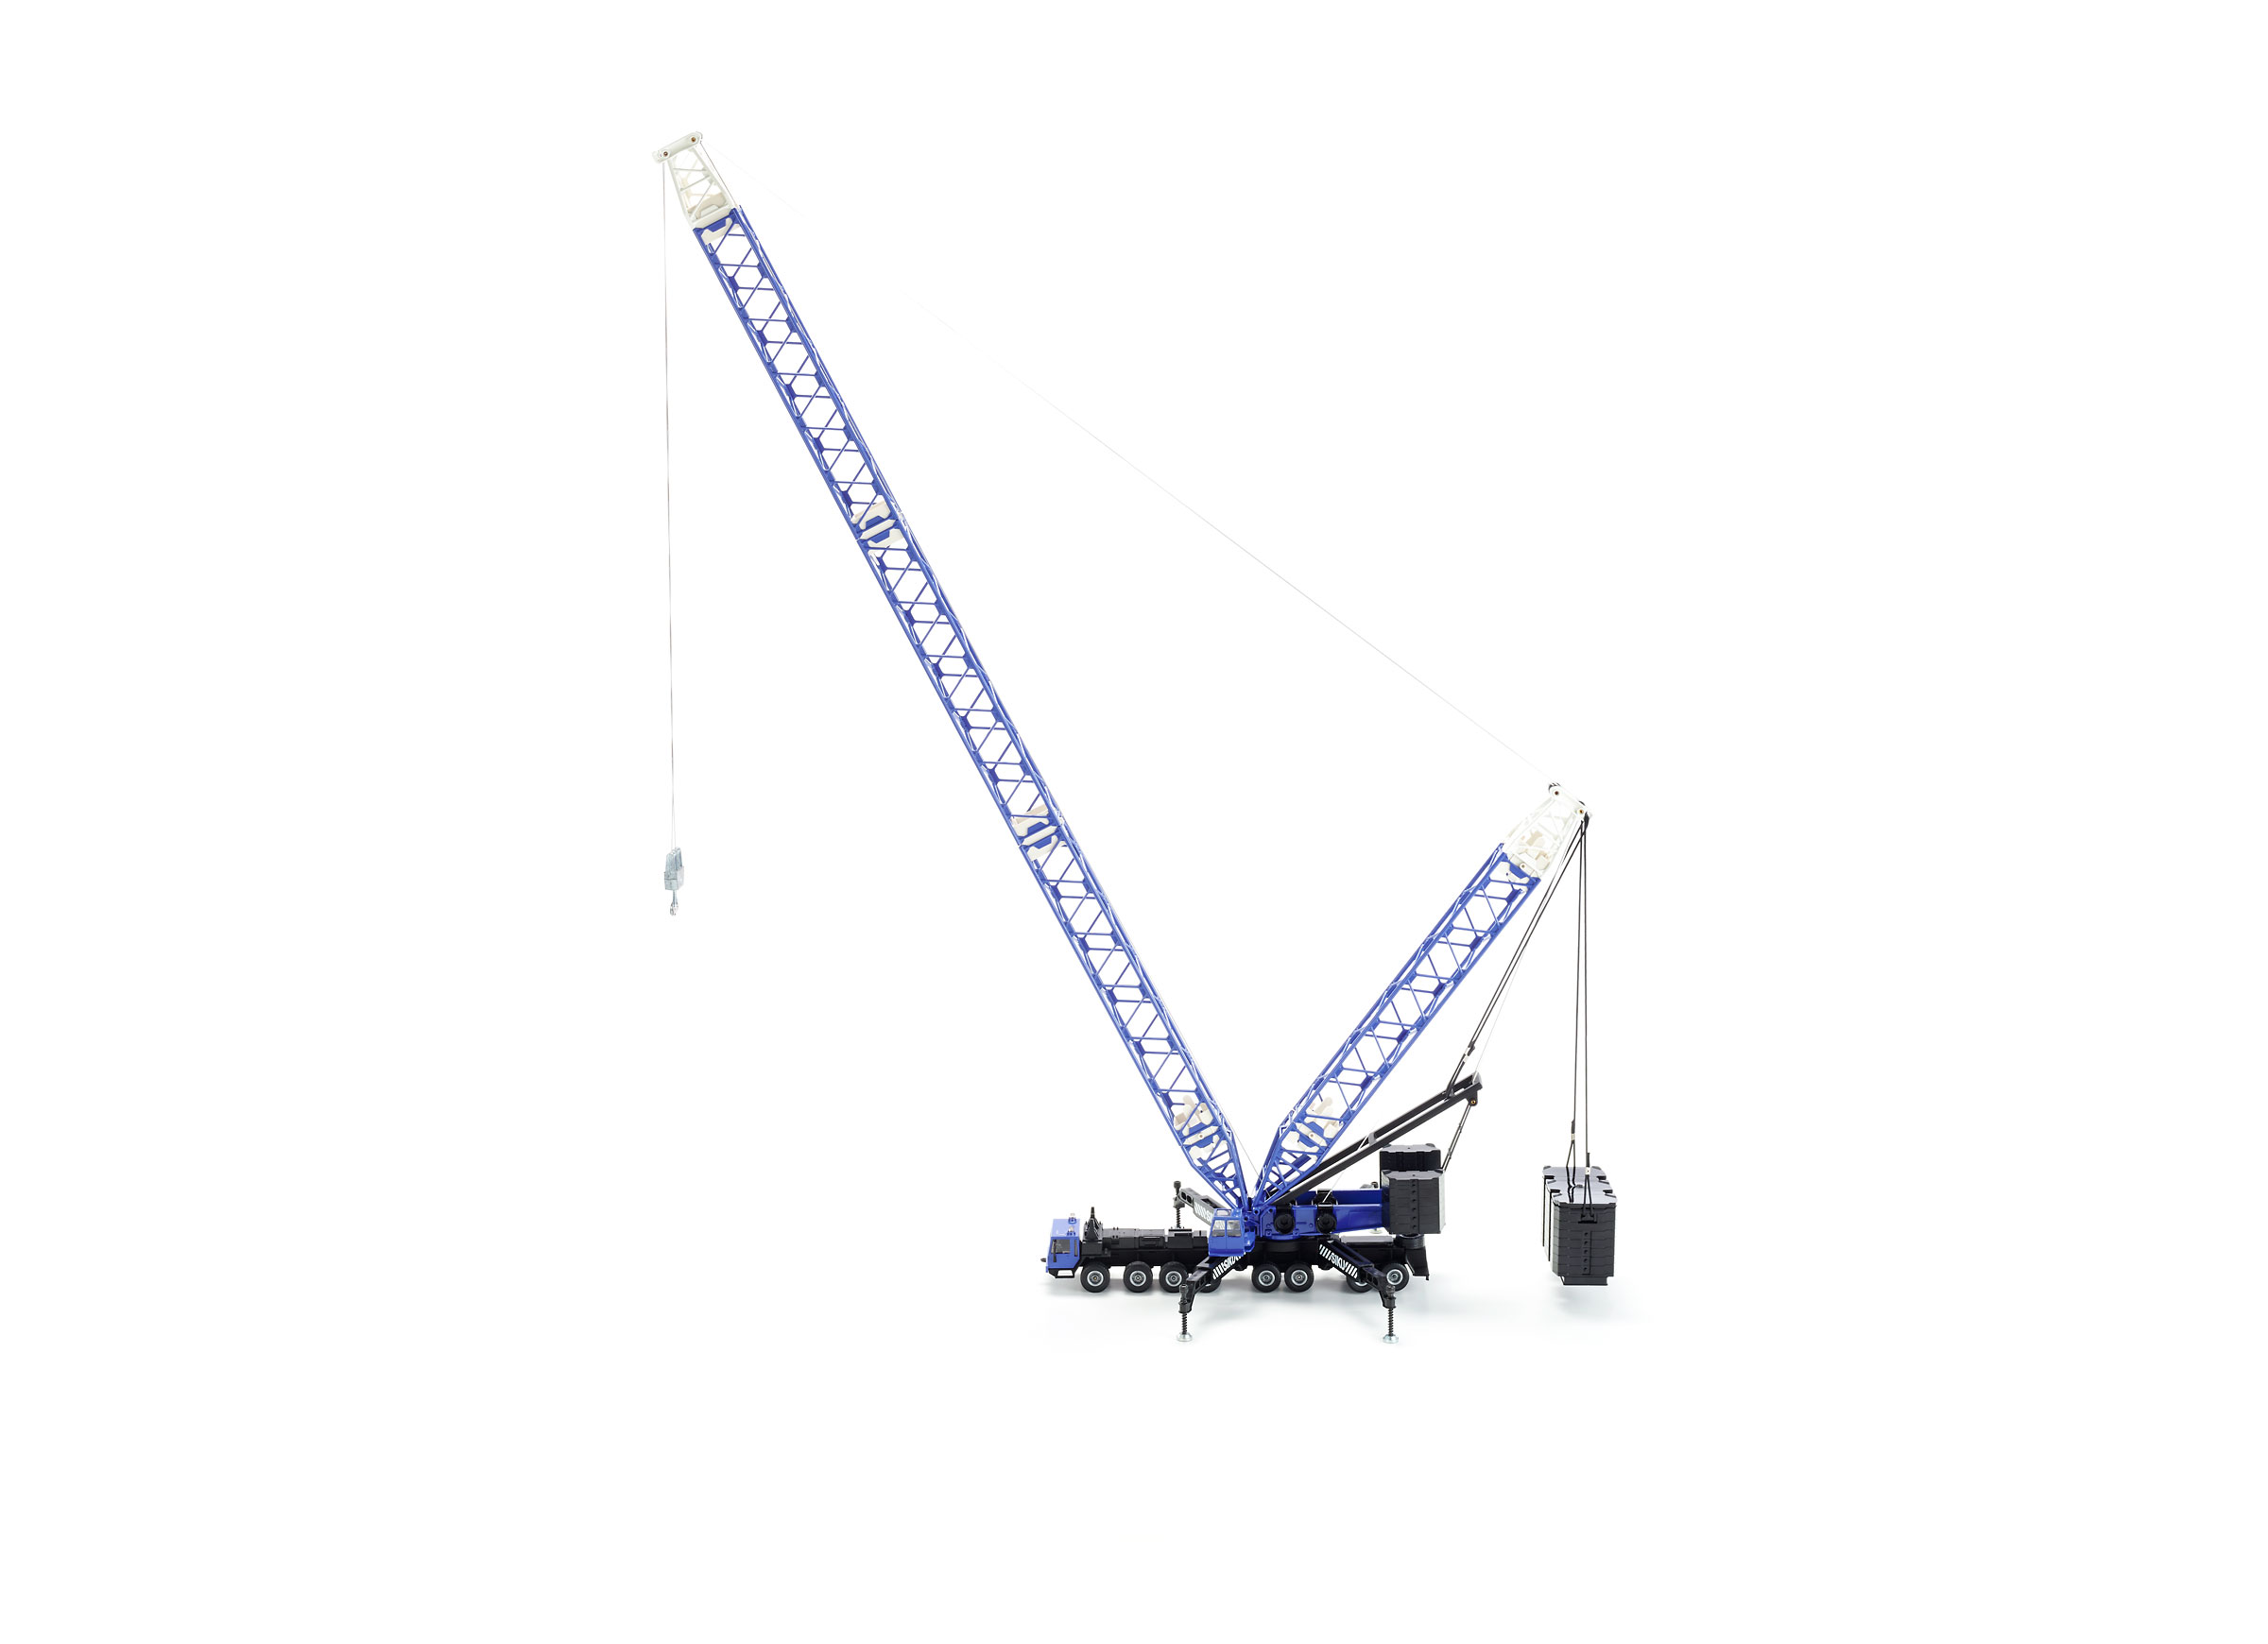 1/55 Scale Model, Siku 4810 Heavy Mobile Crane Diecast Scale Model.